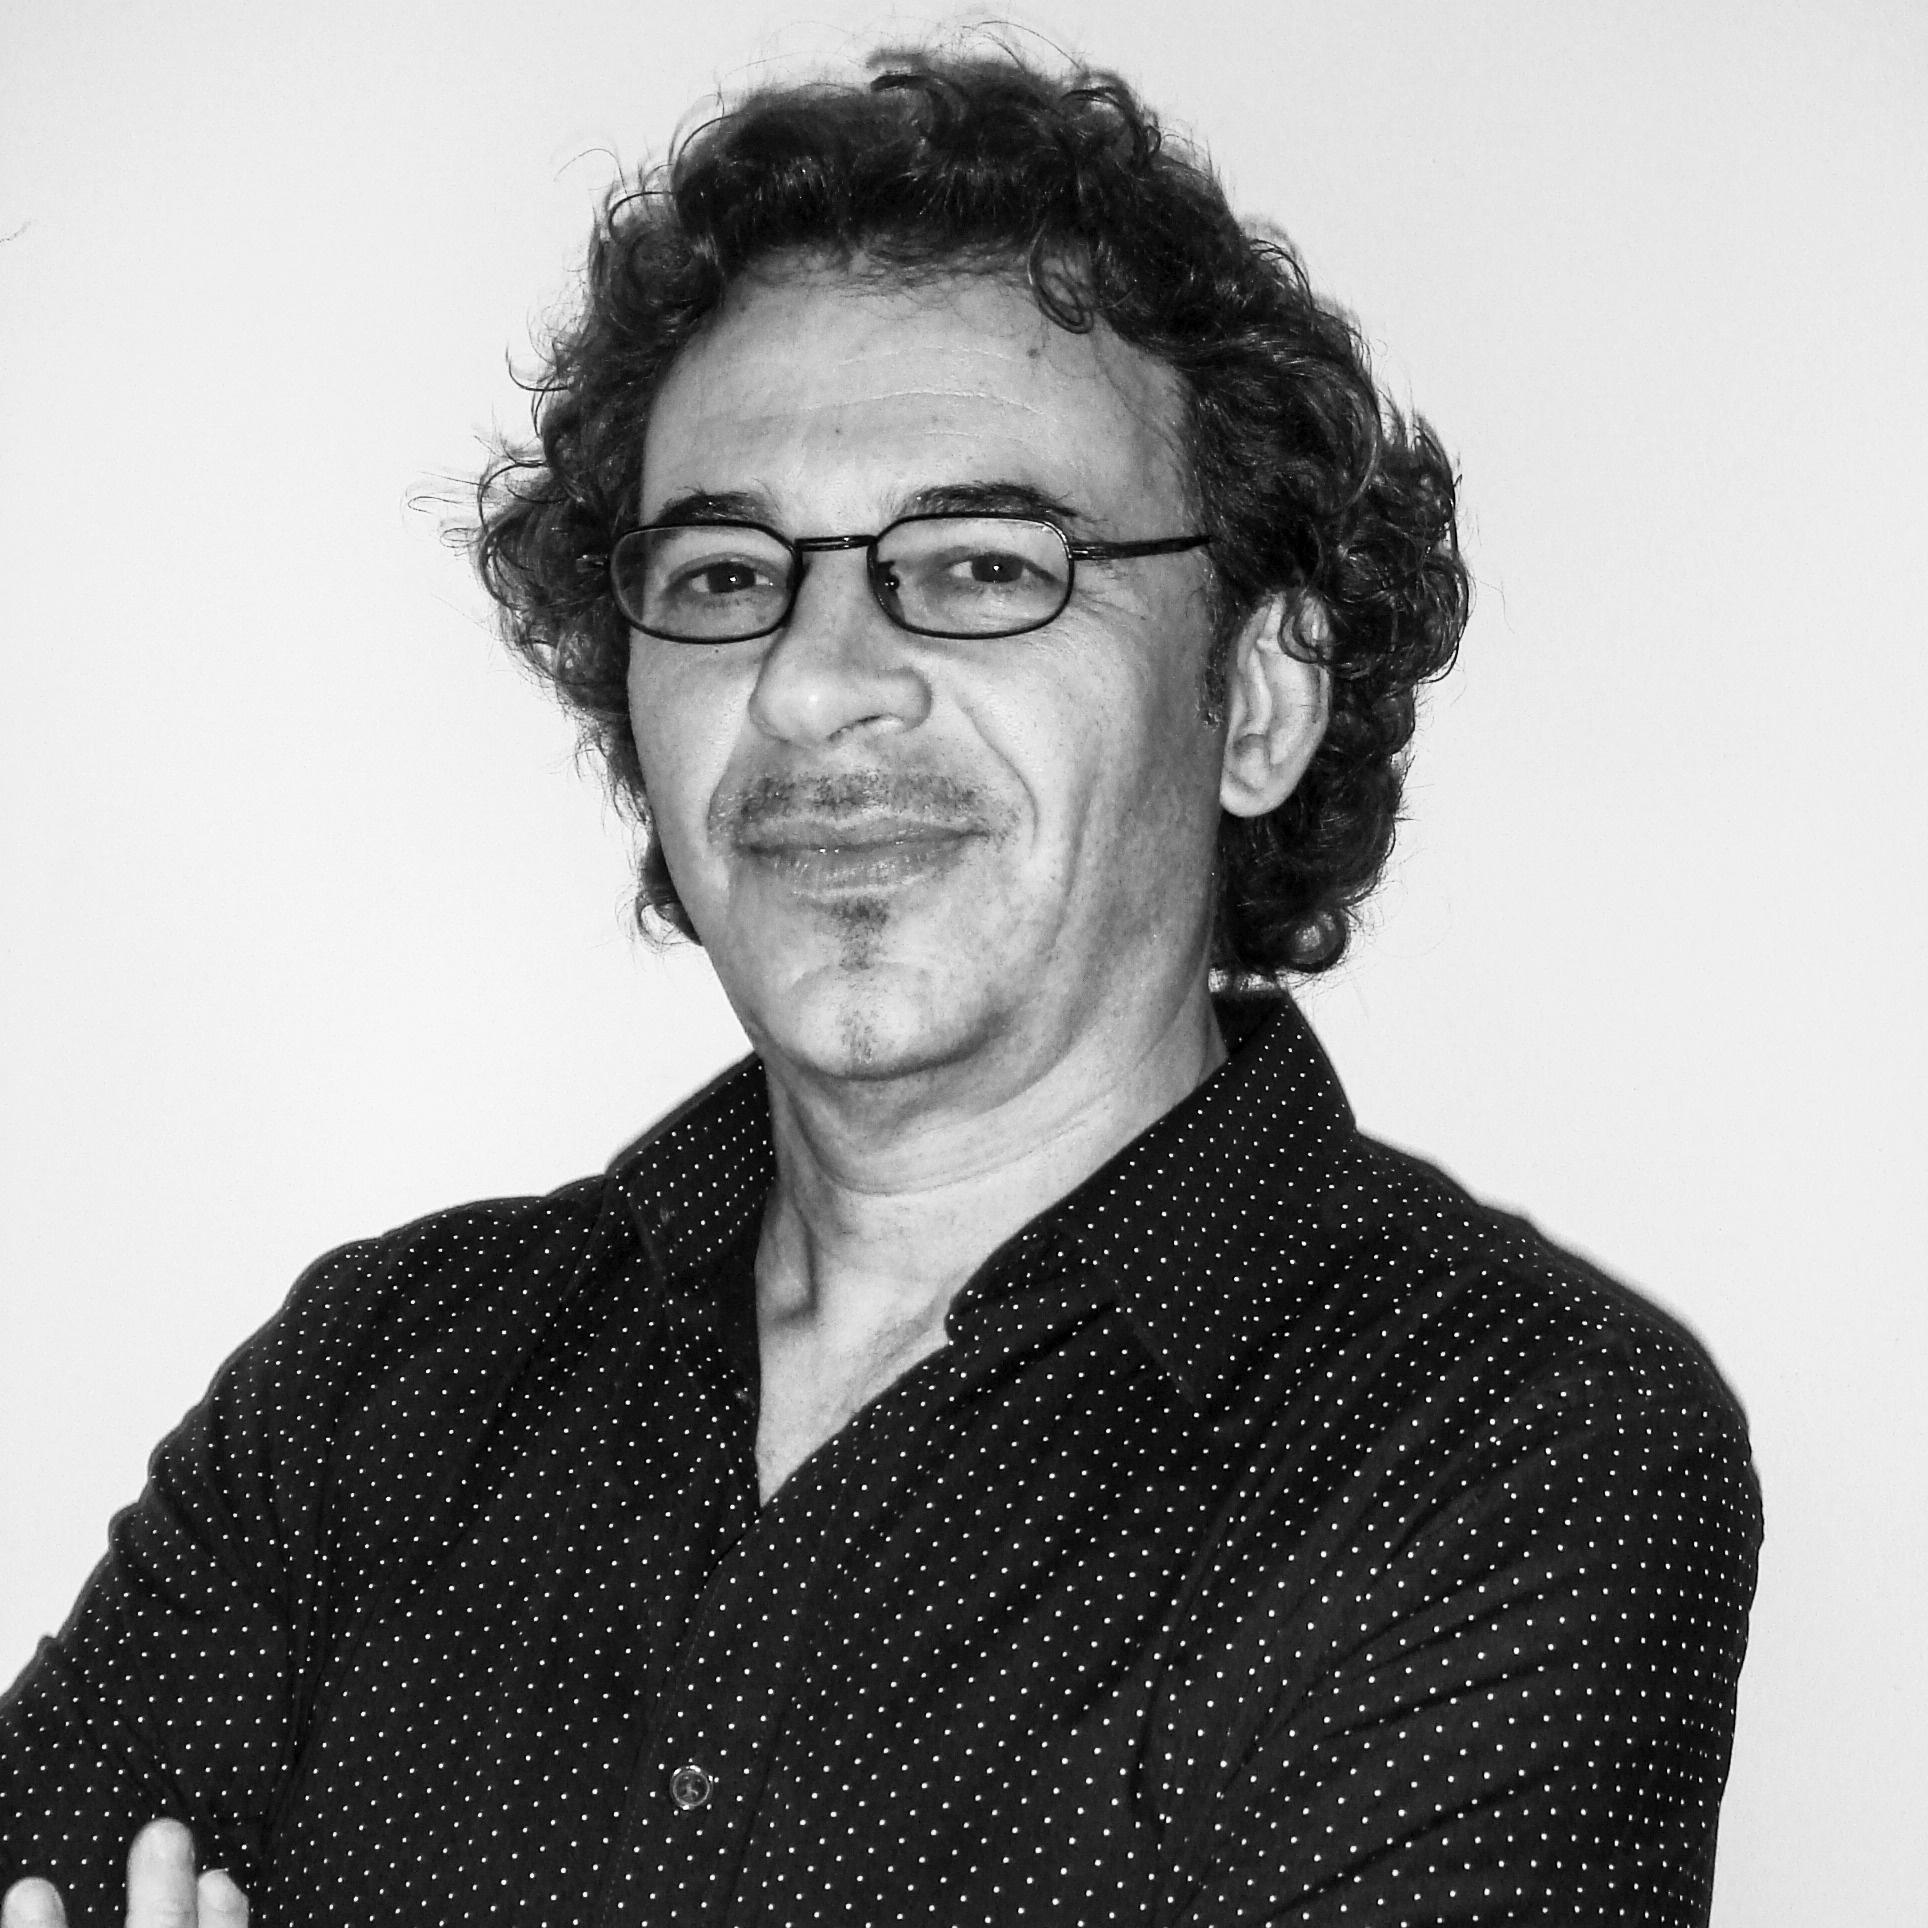 Massimo Zucchini